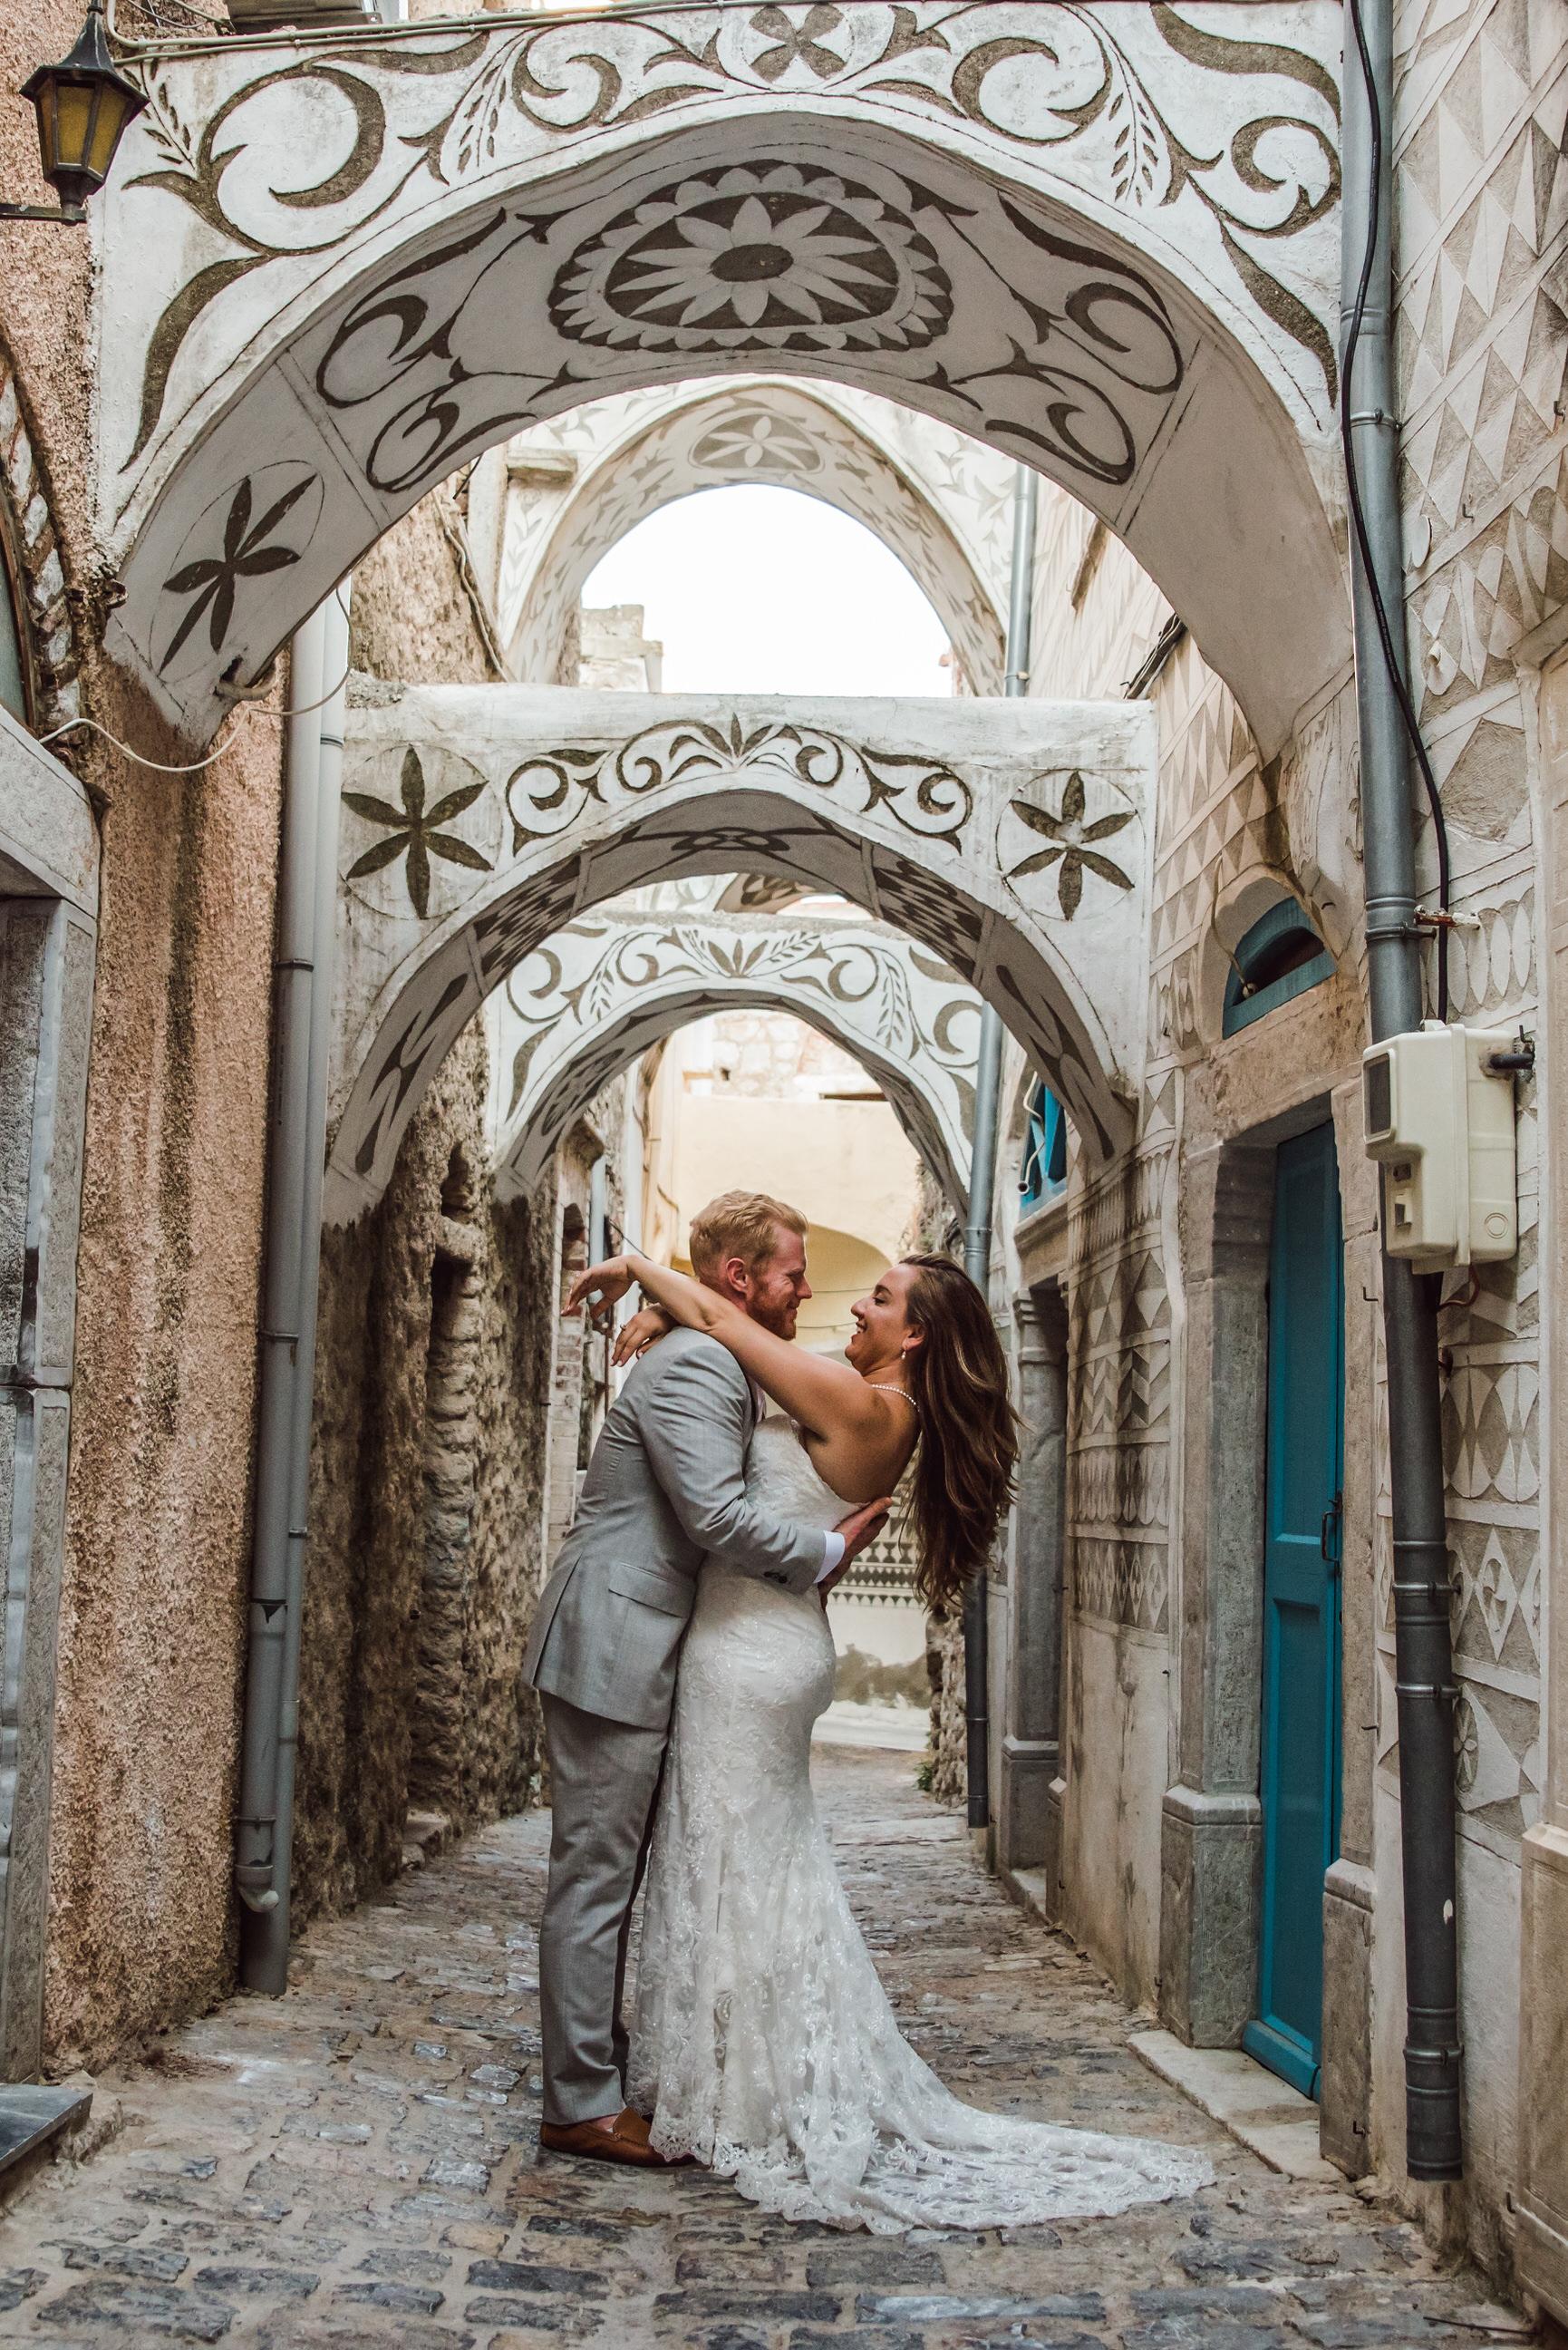 GreeceWedding-Tricia&Will-DayAfter-171.jpg